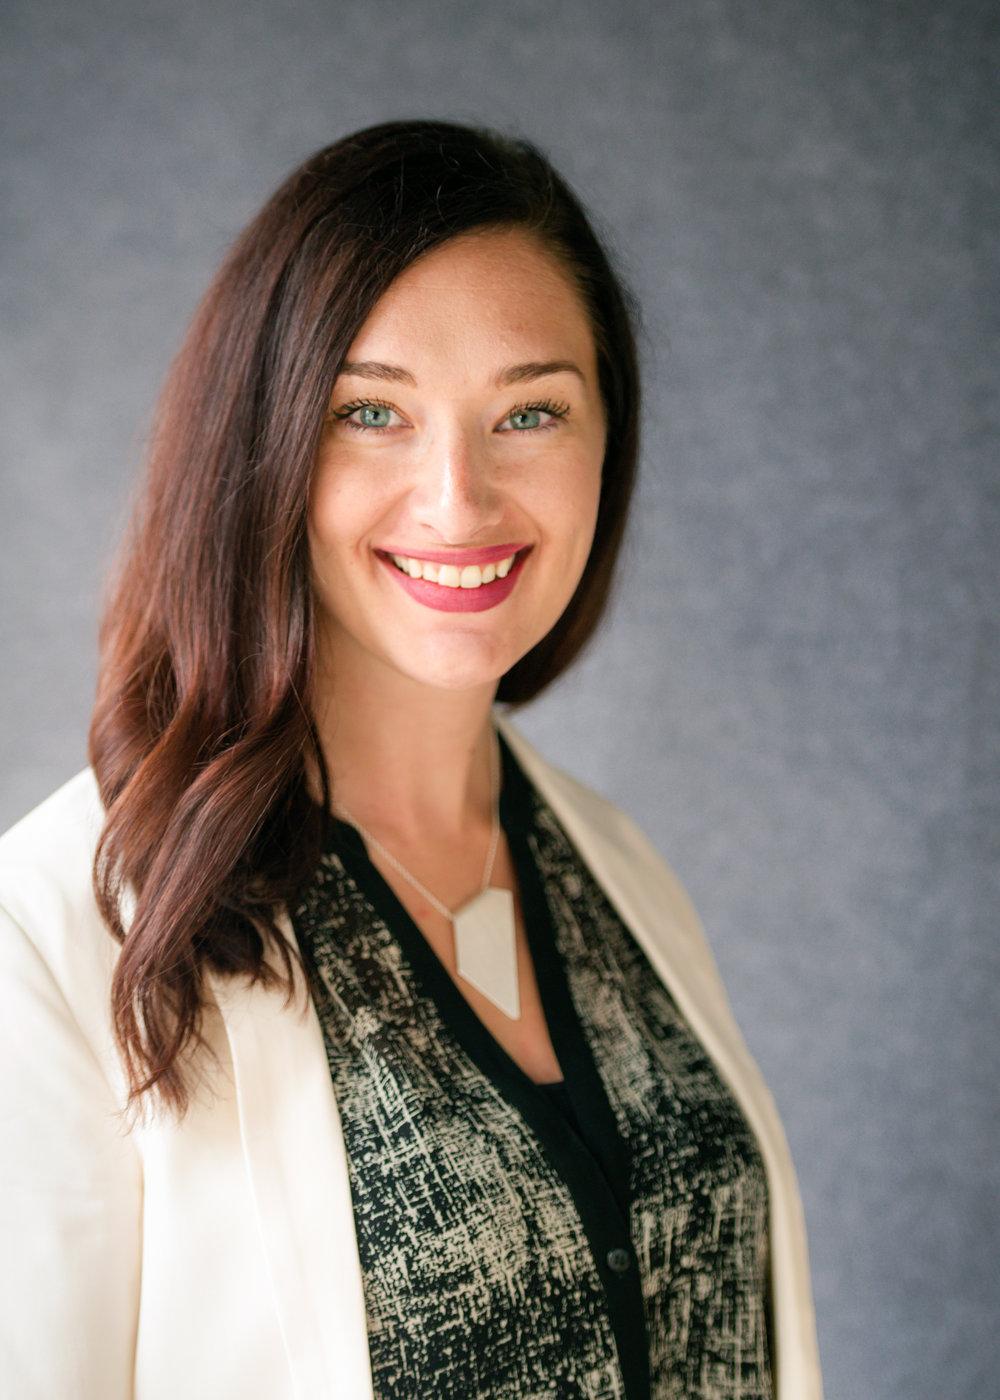 Meagan Nielsen